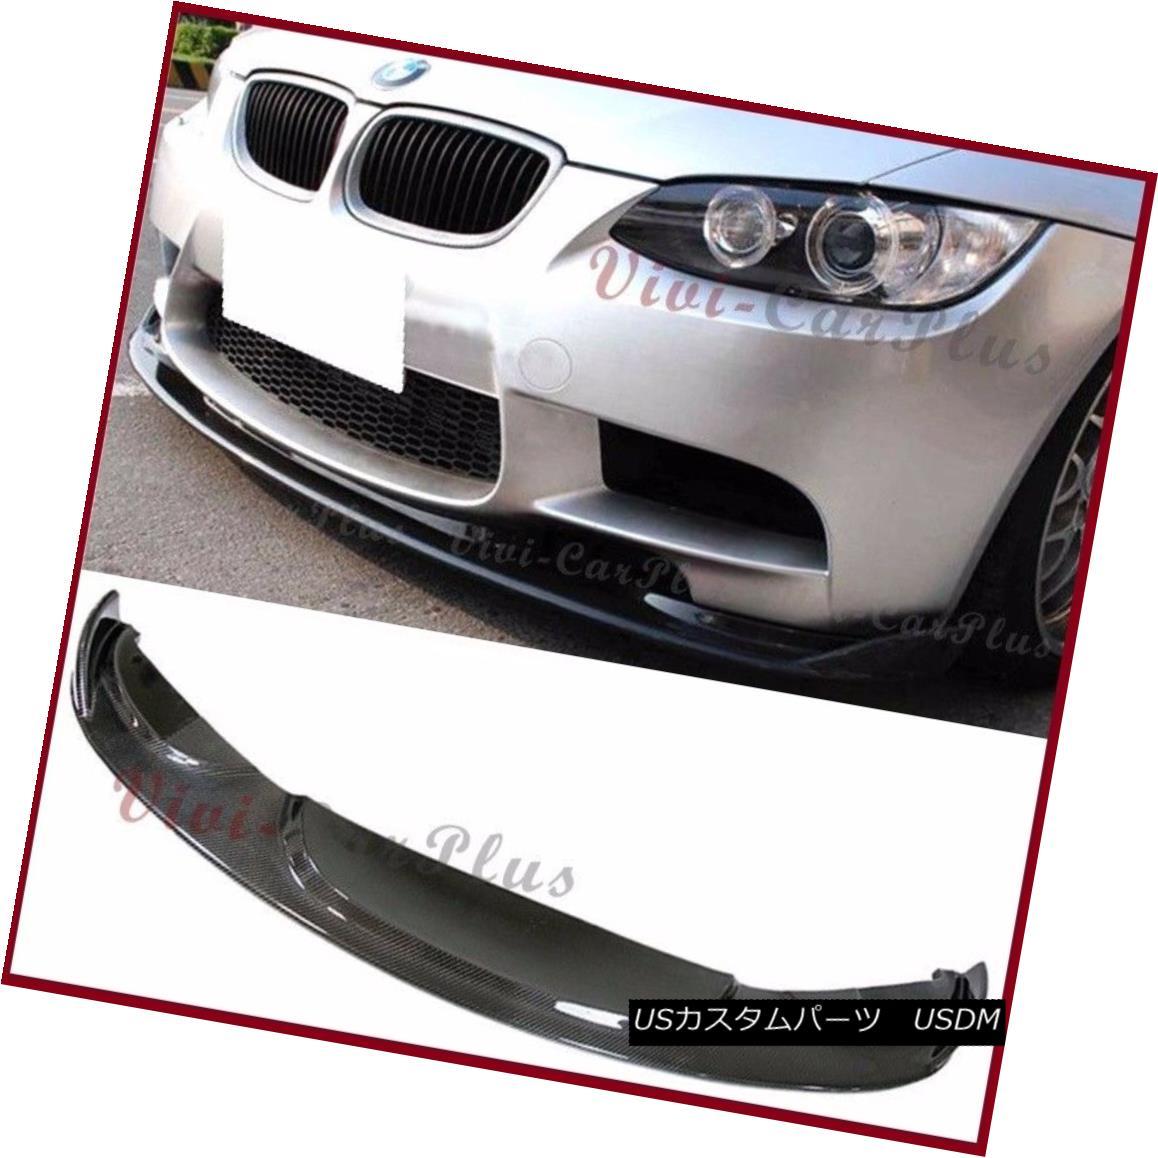 Fit For 2008-13 BMW E90 E92 E93 M3 Bumper V Look 3K Carbon Fiber Front Lower Lip